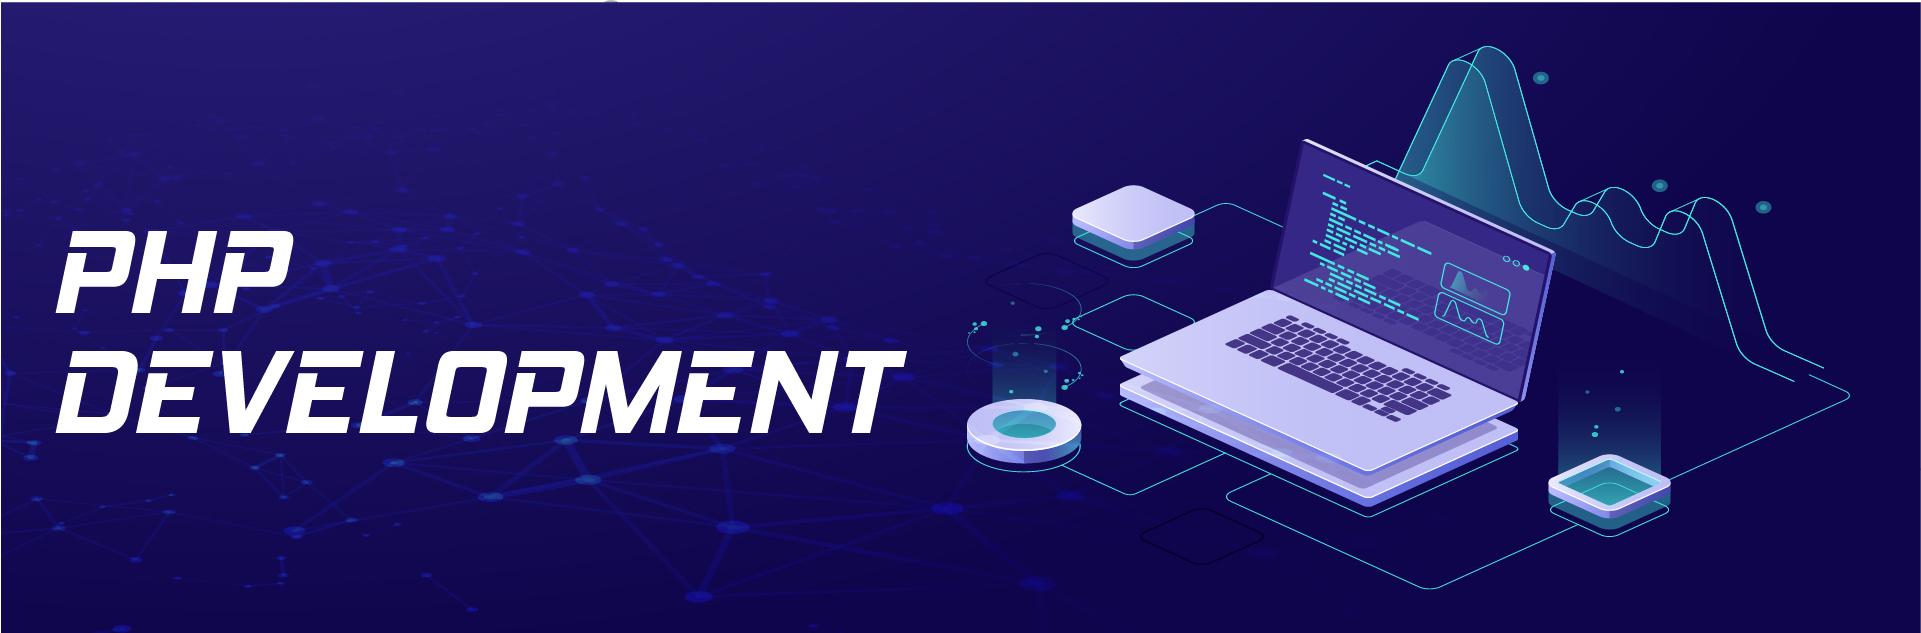 PHP Development Company In India